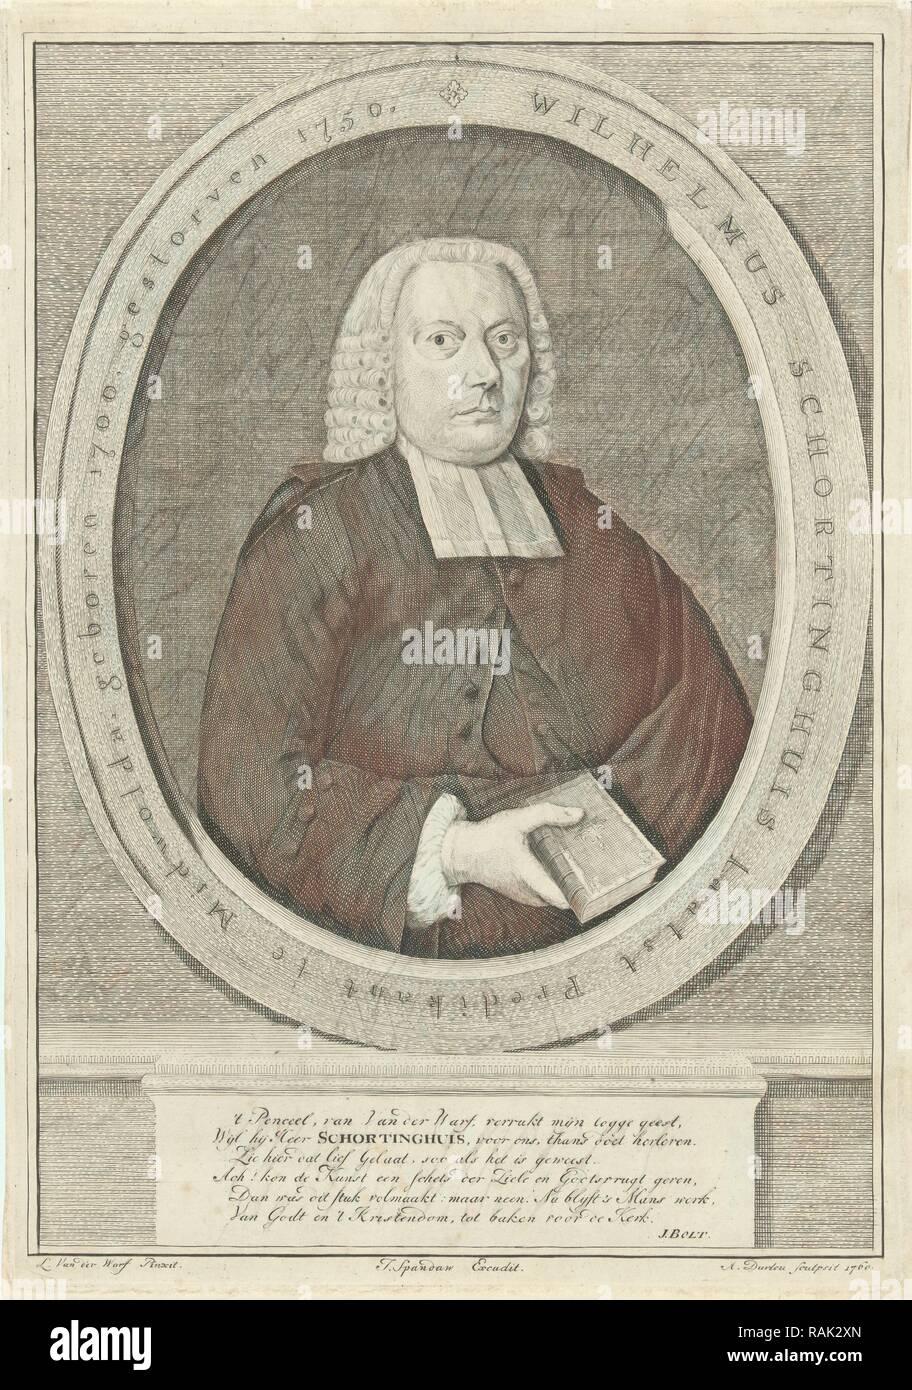 Portrait of the pastor Wilhelmus Schortinghuis, A. Durleu, Jurjen Spandaw, J. Bolt, 1760. Reimagined - Stock Image